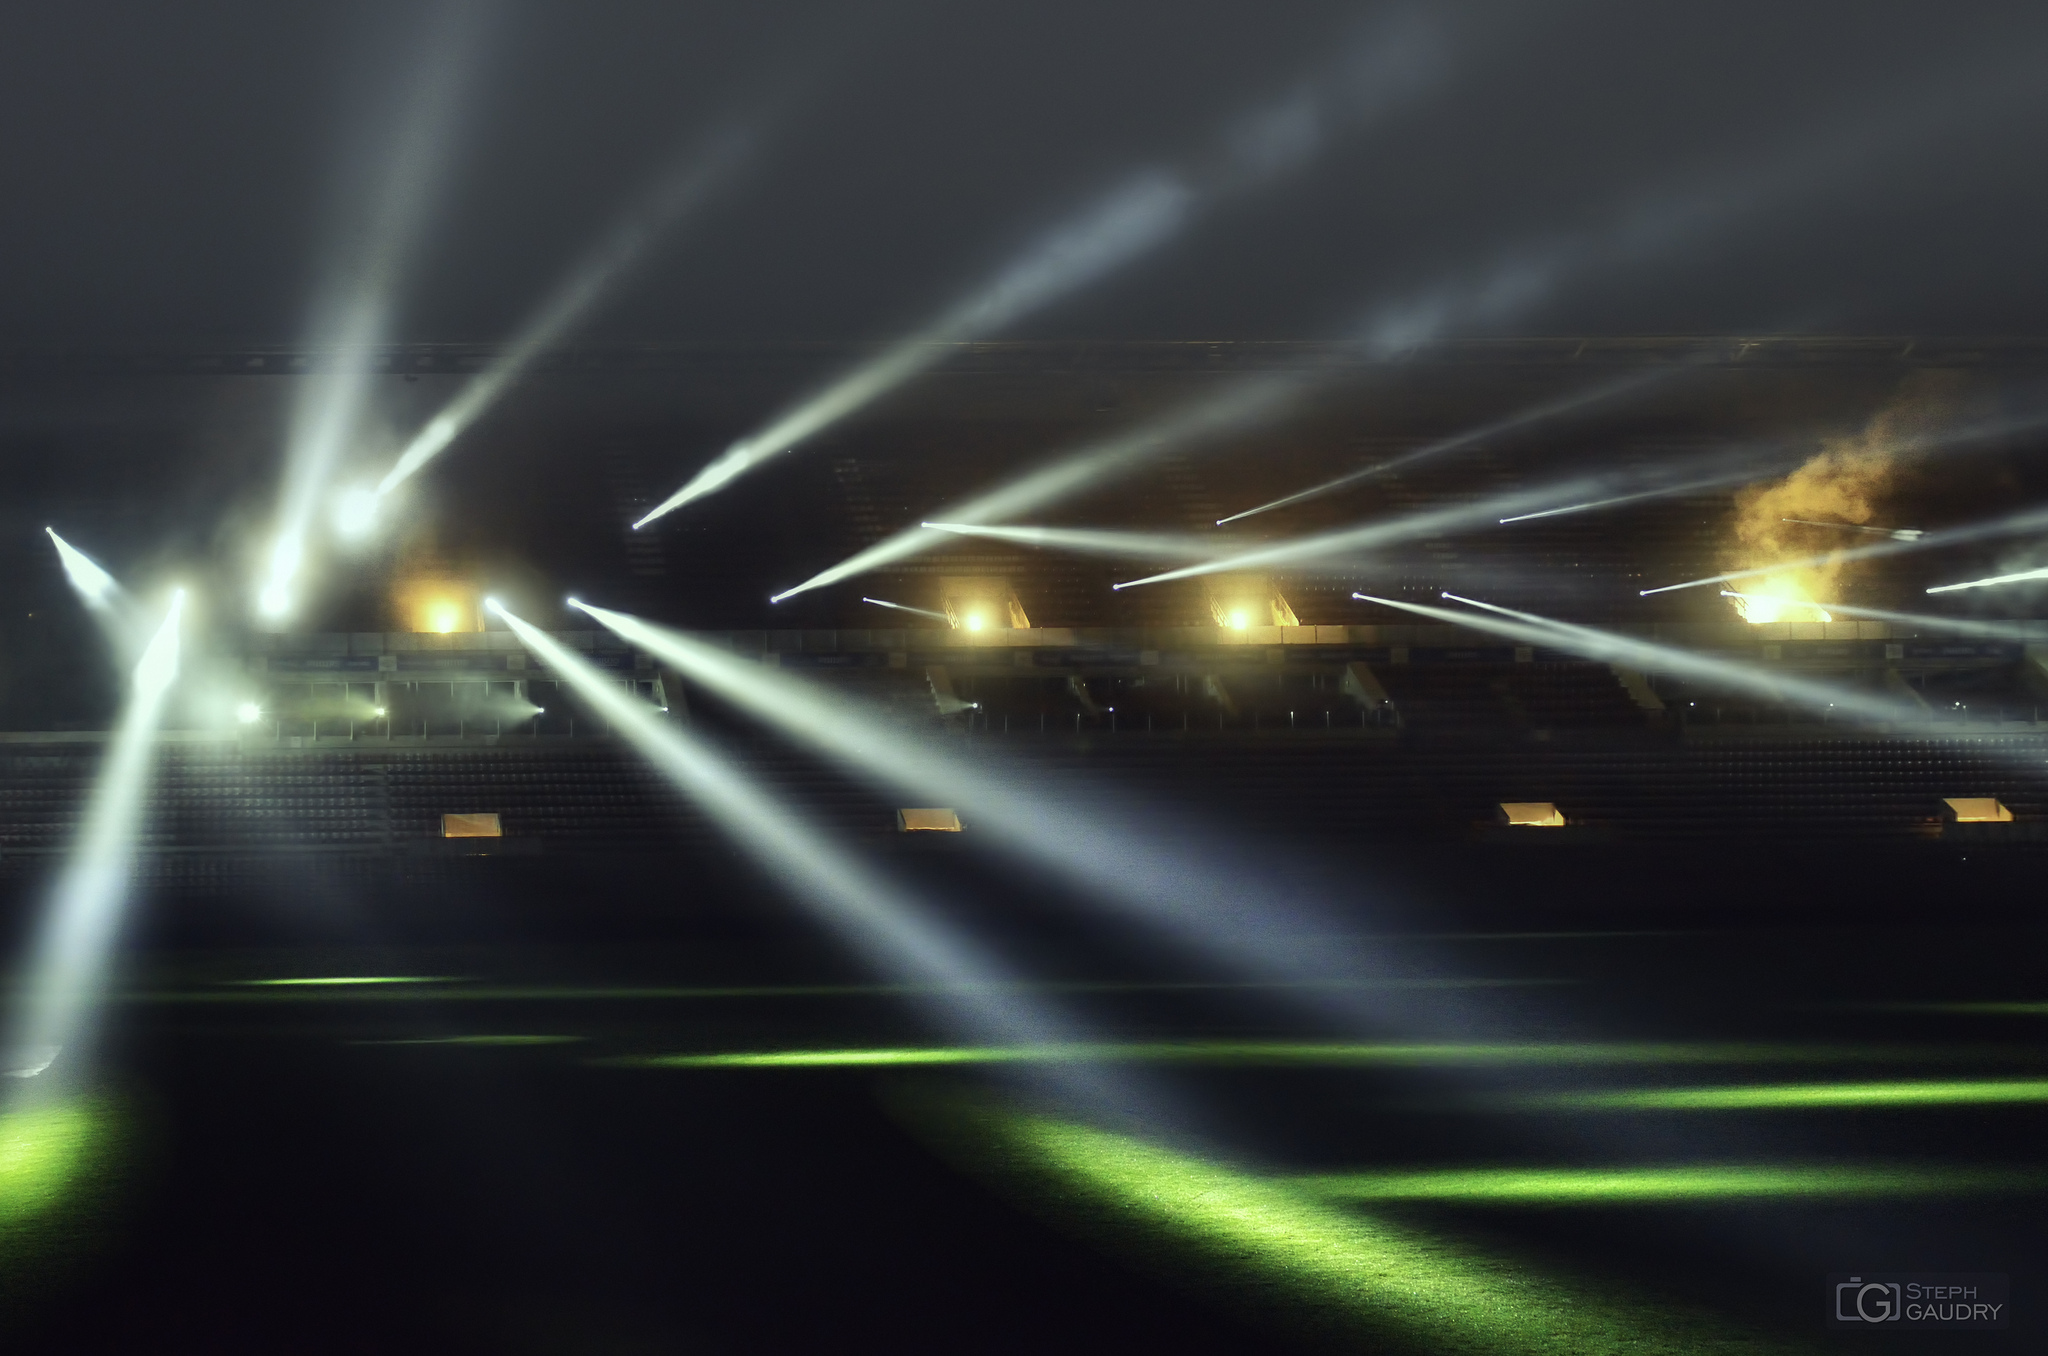 Eindhoven glow 2013 - Noralie 1